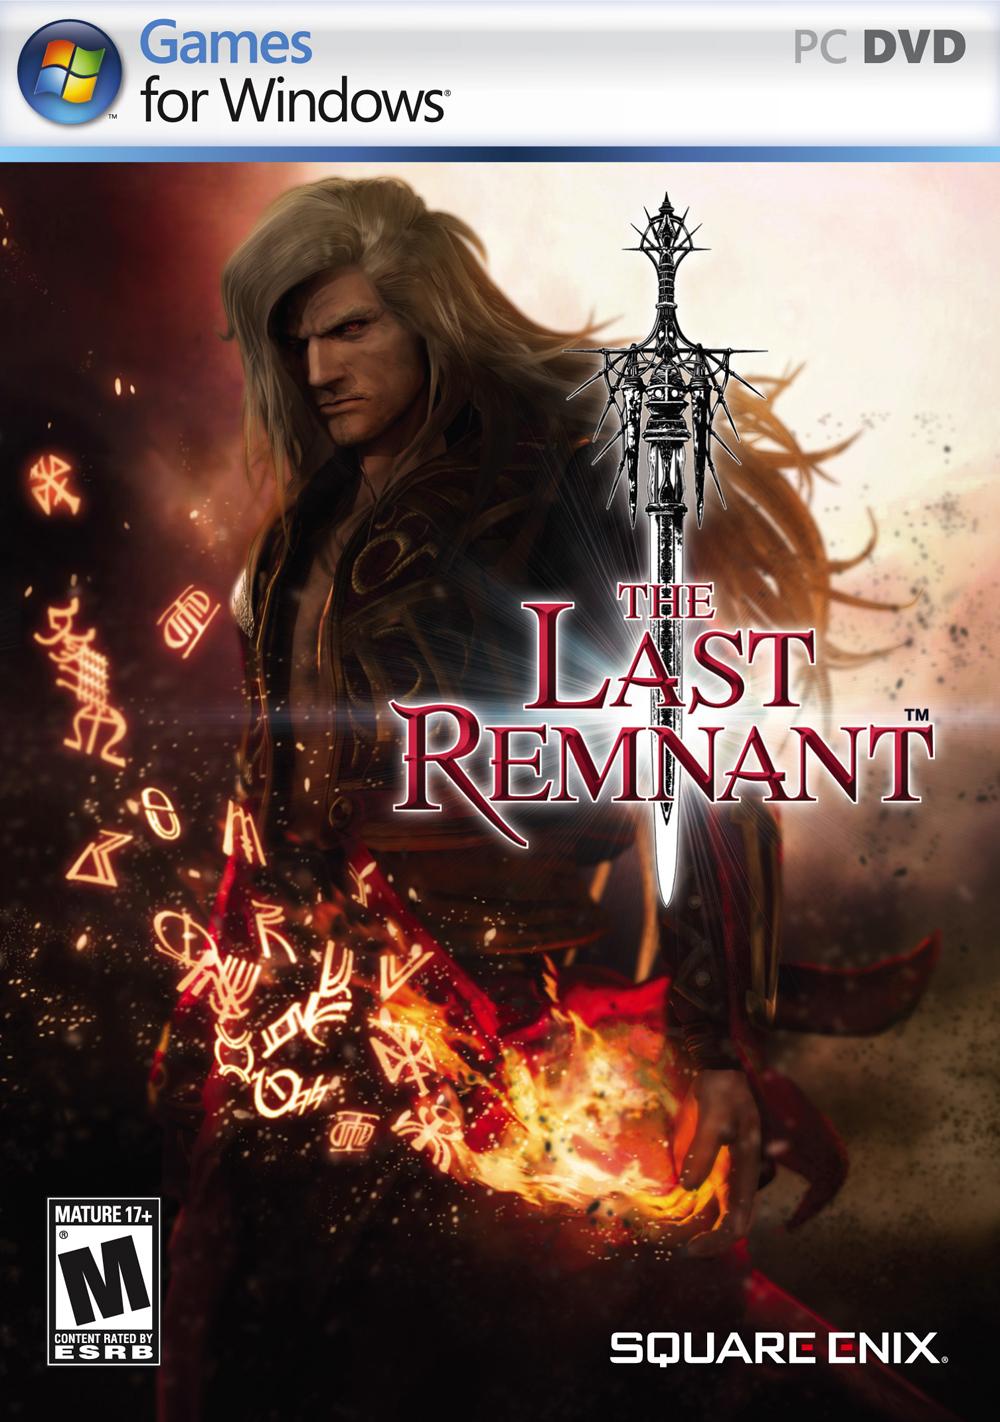 THE LAST REMNANT ((تکی4000تومان عمده2200تومان(هر5عدد) ))